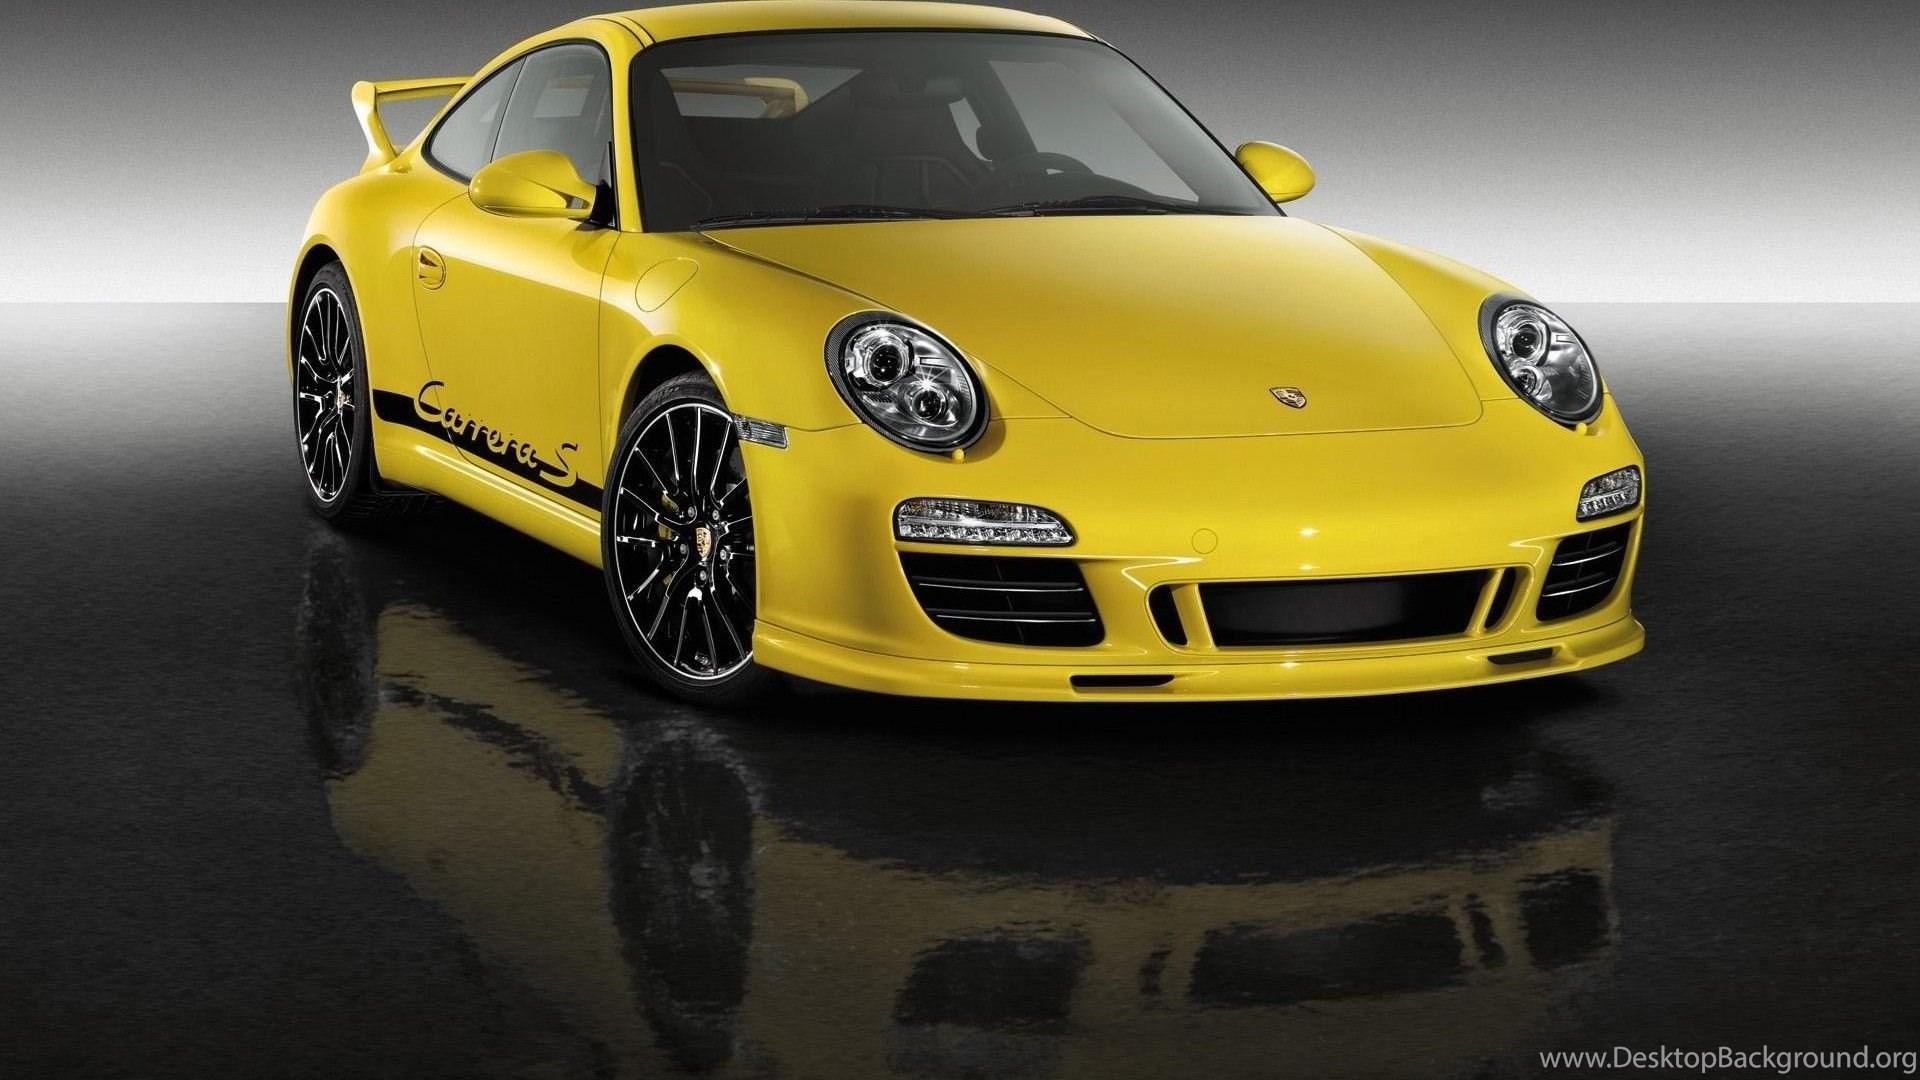 Yellow Porsche 911 Turbo Wallpapers Image Gallery Vehicle Wallpapers Desktop Background